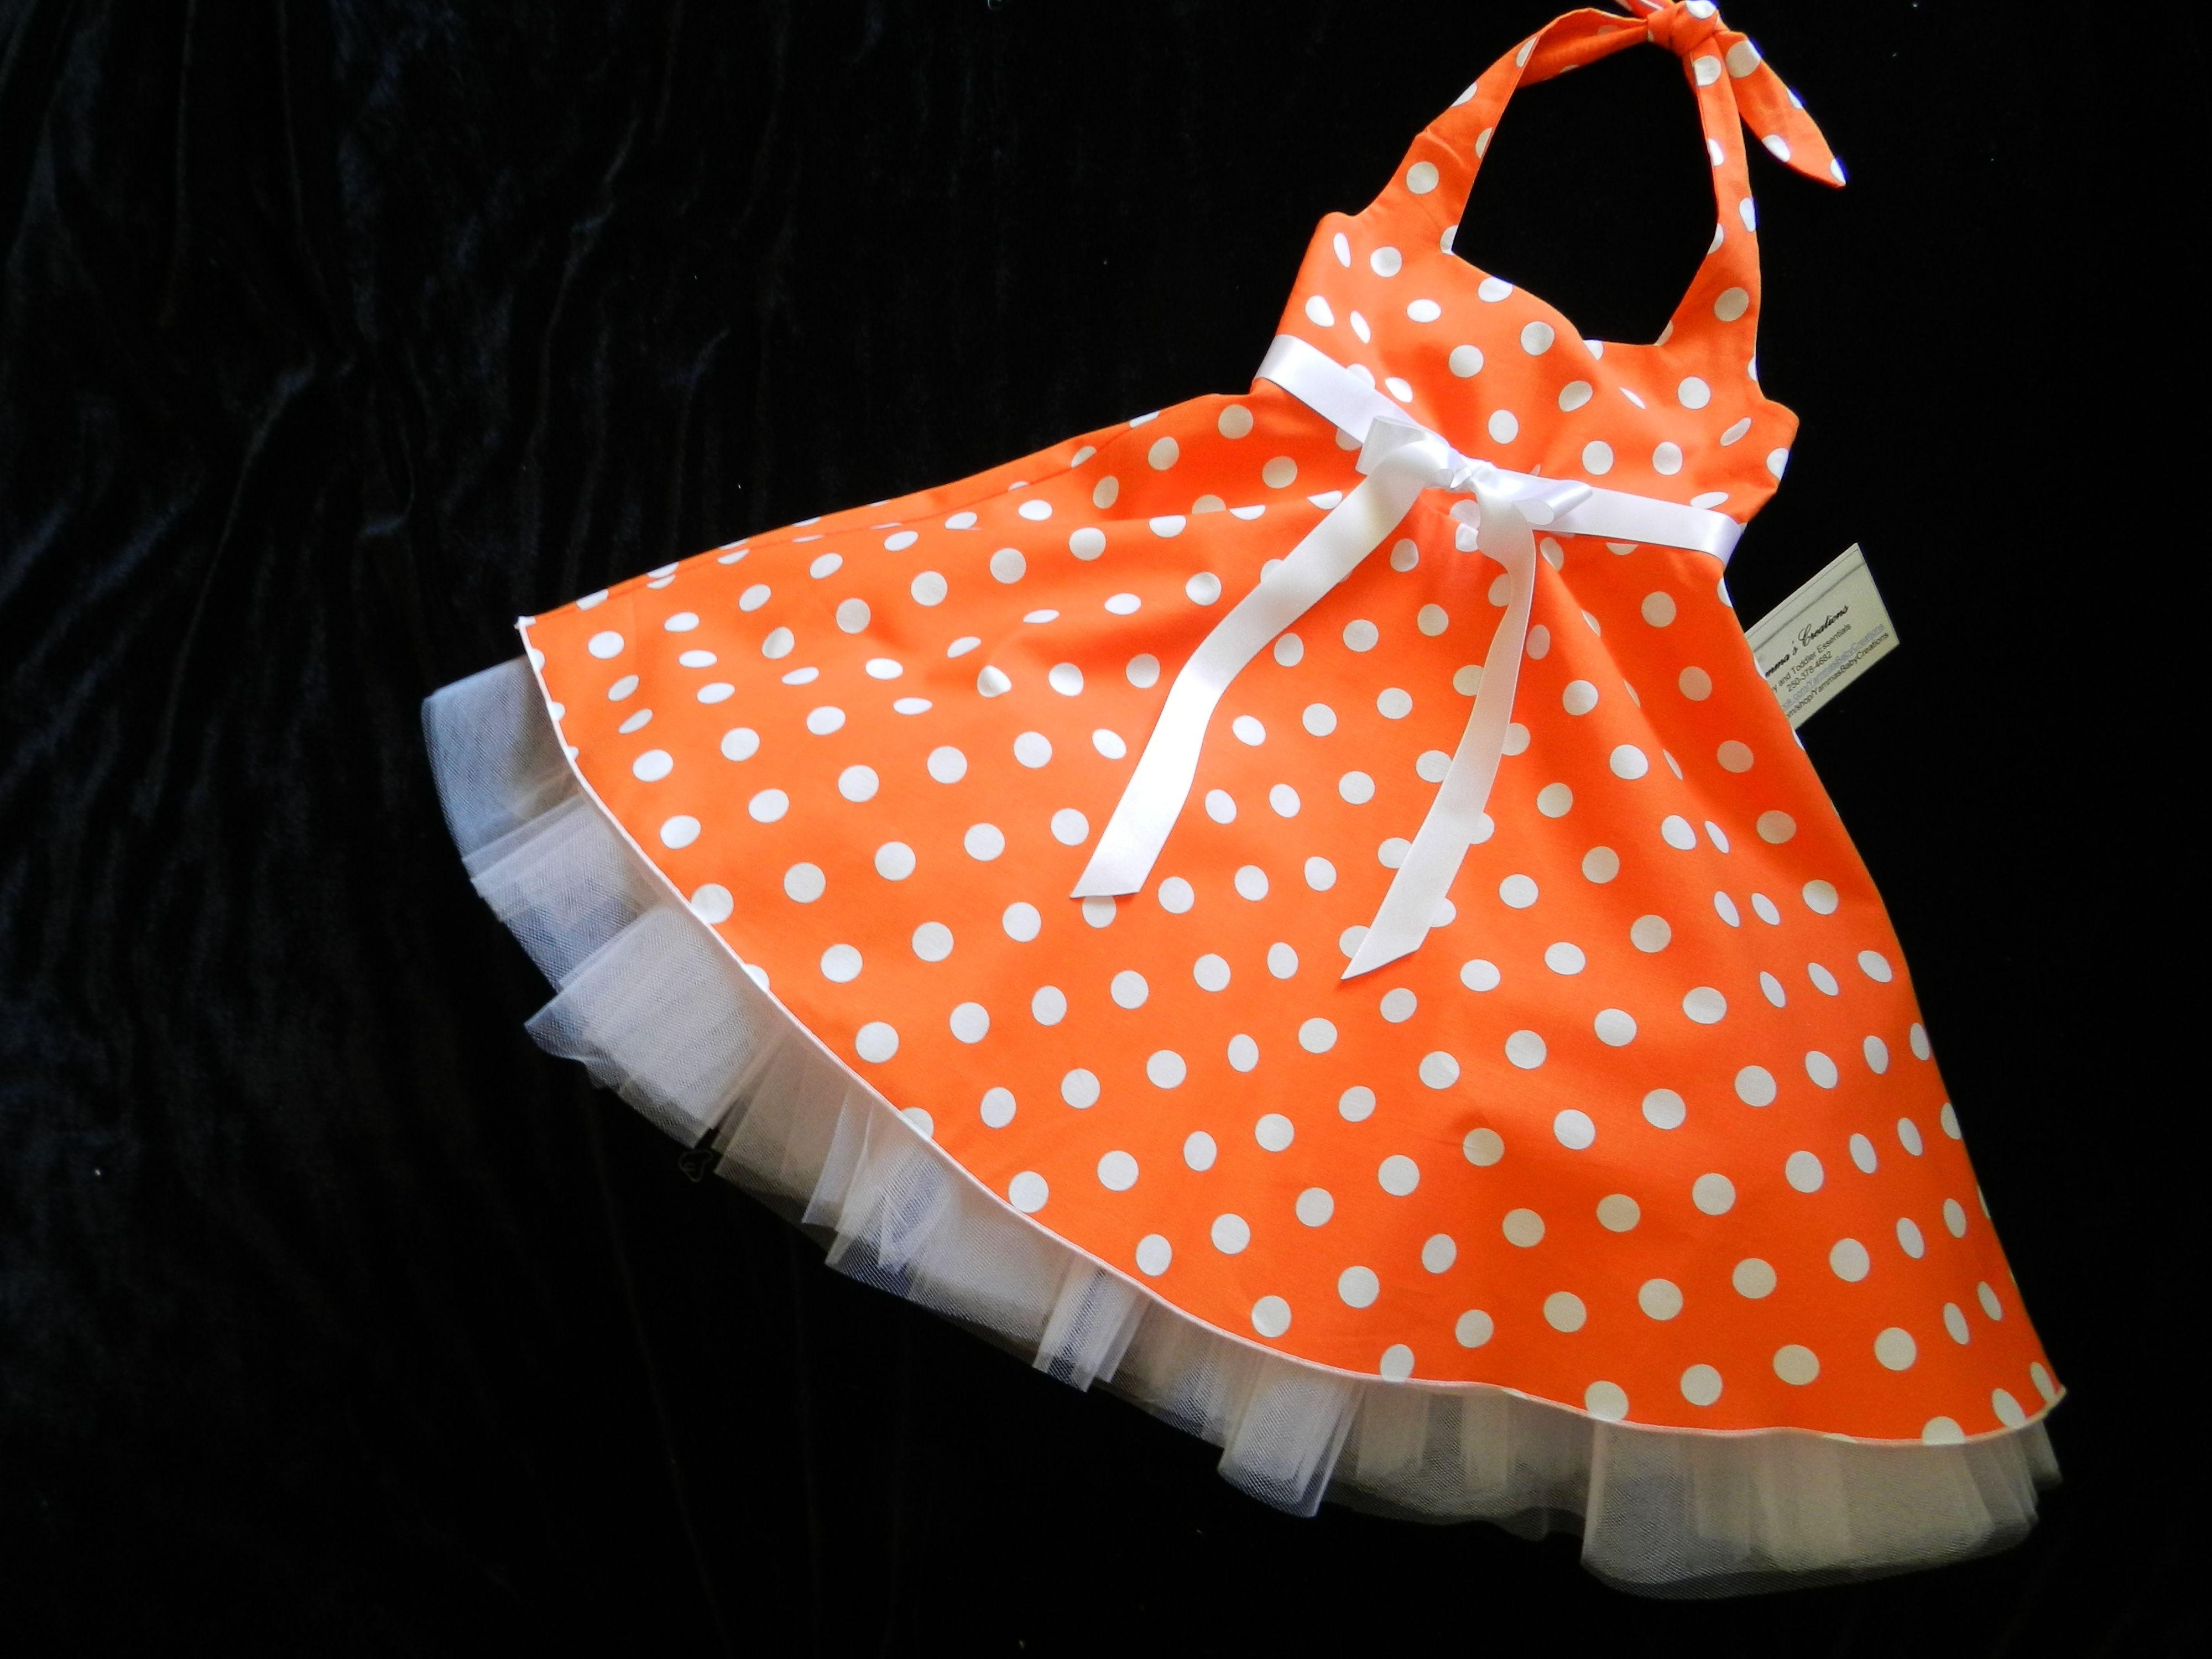 c6c821326f83 100% cotton orange polka dot sundress